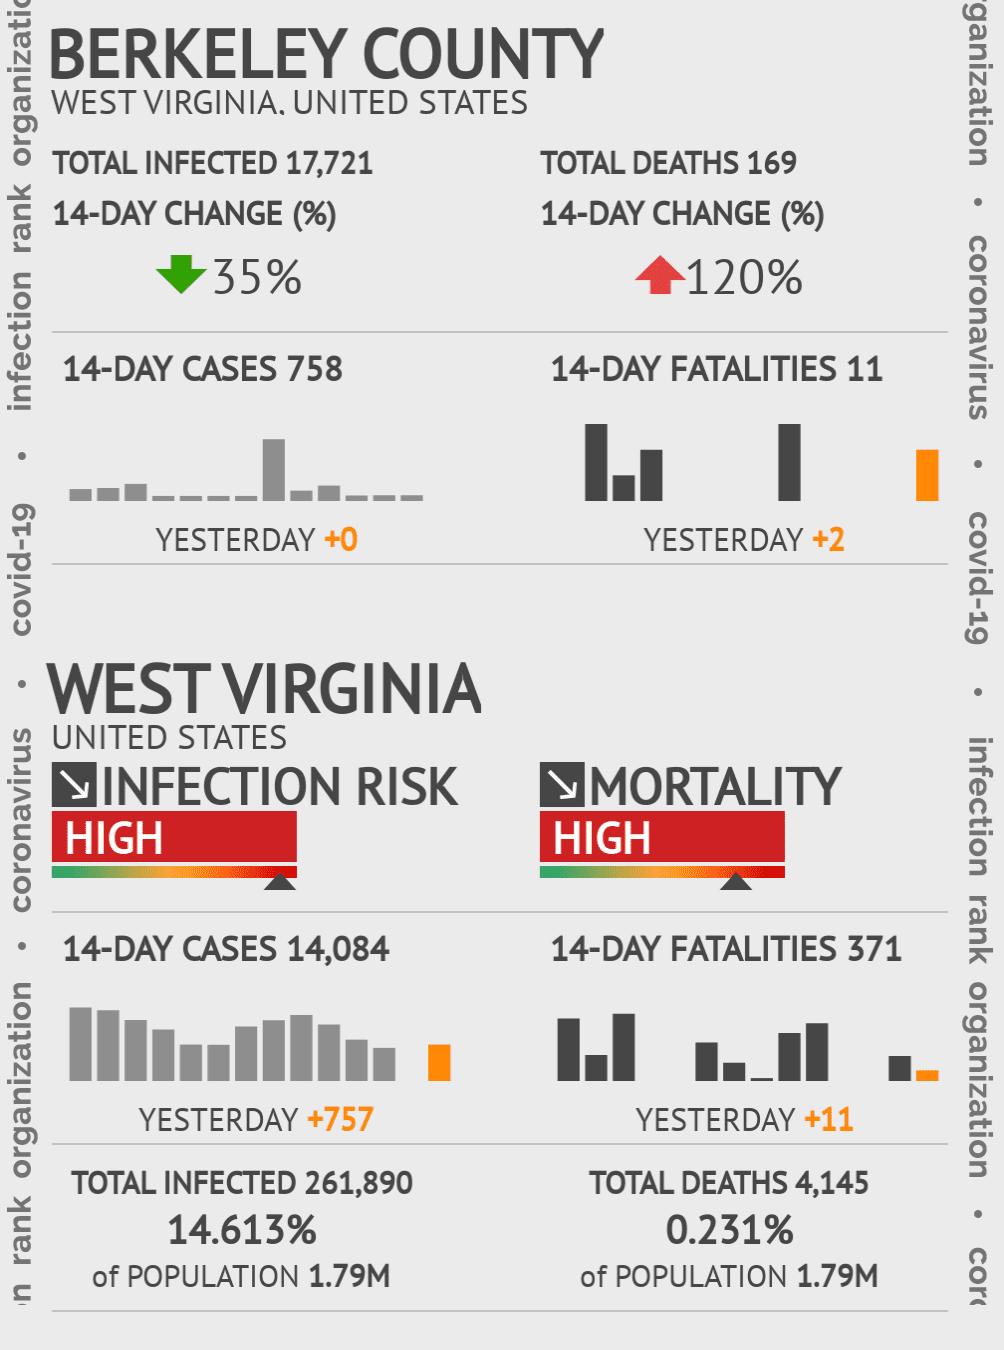 Berkeley County Coronavirus Covid-19 Risk of Infection on July 24, 2021